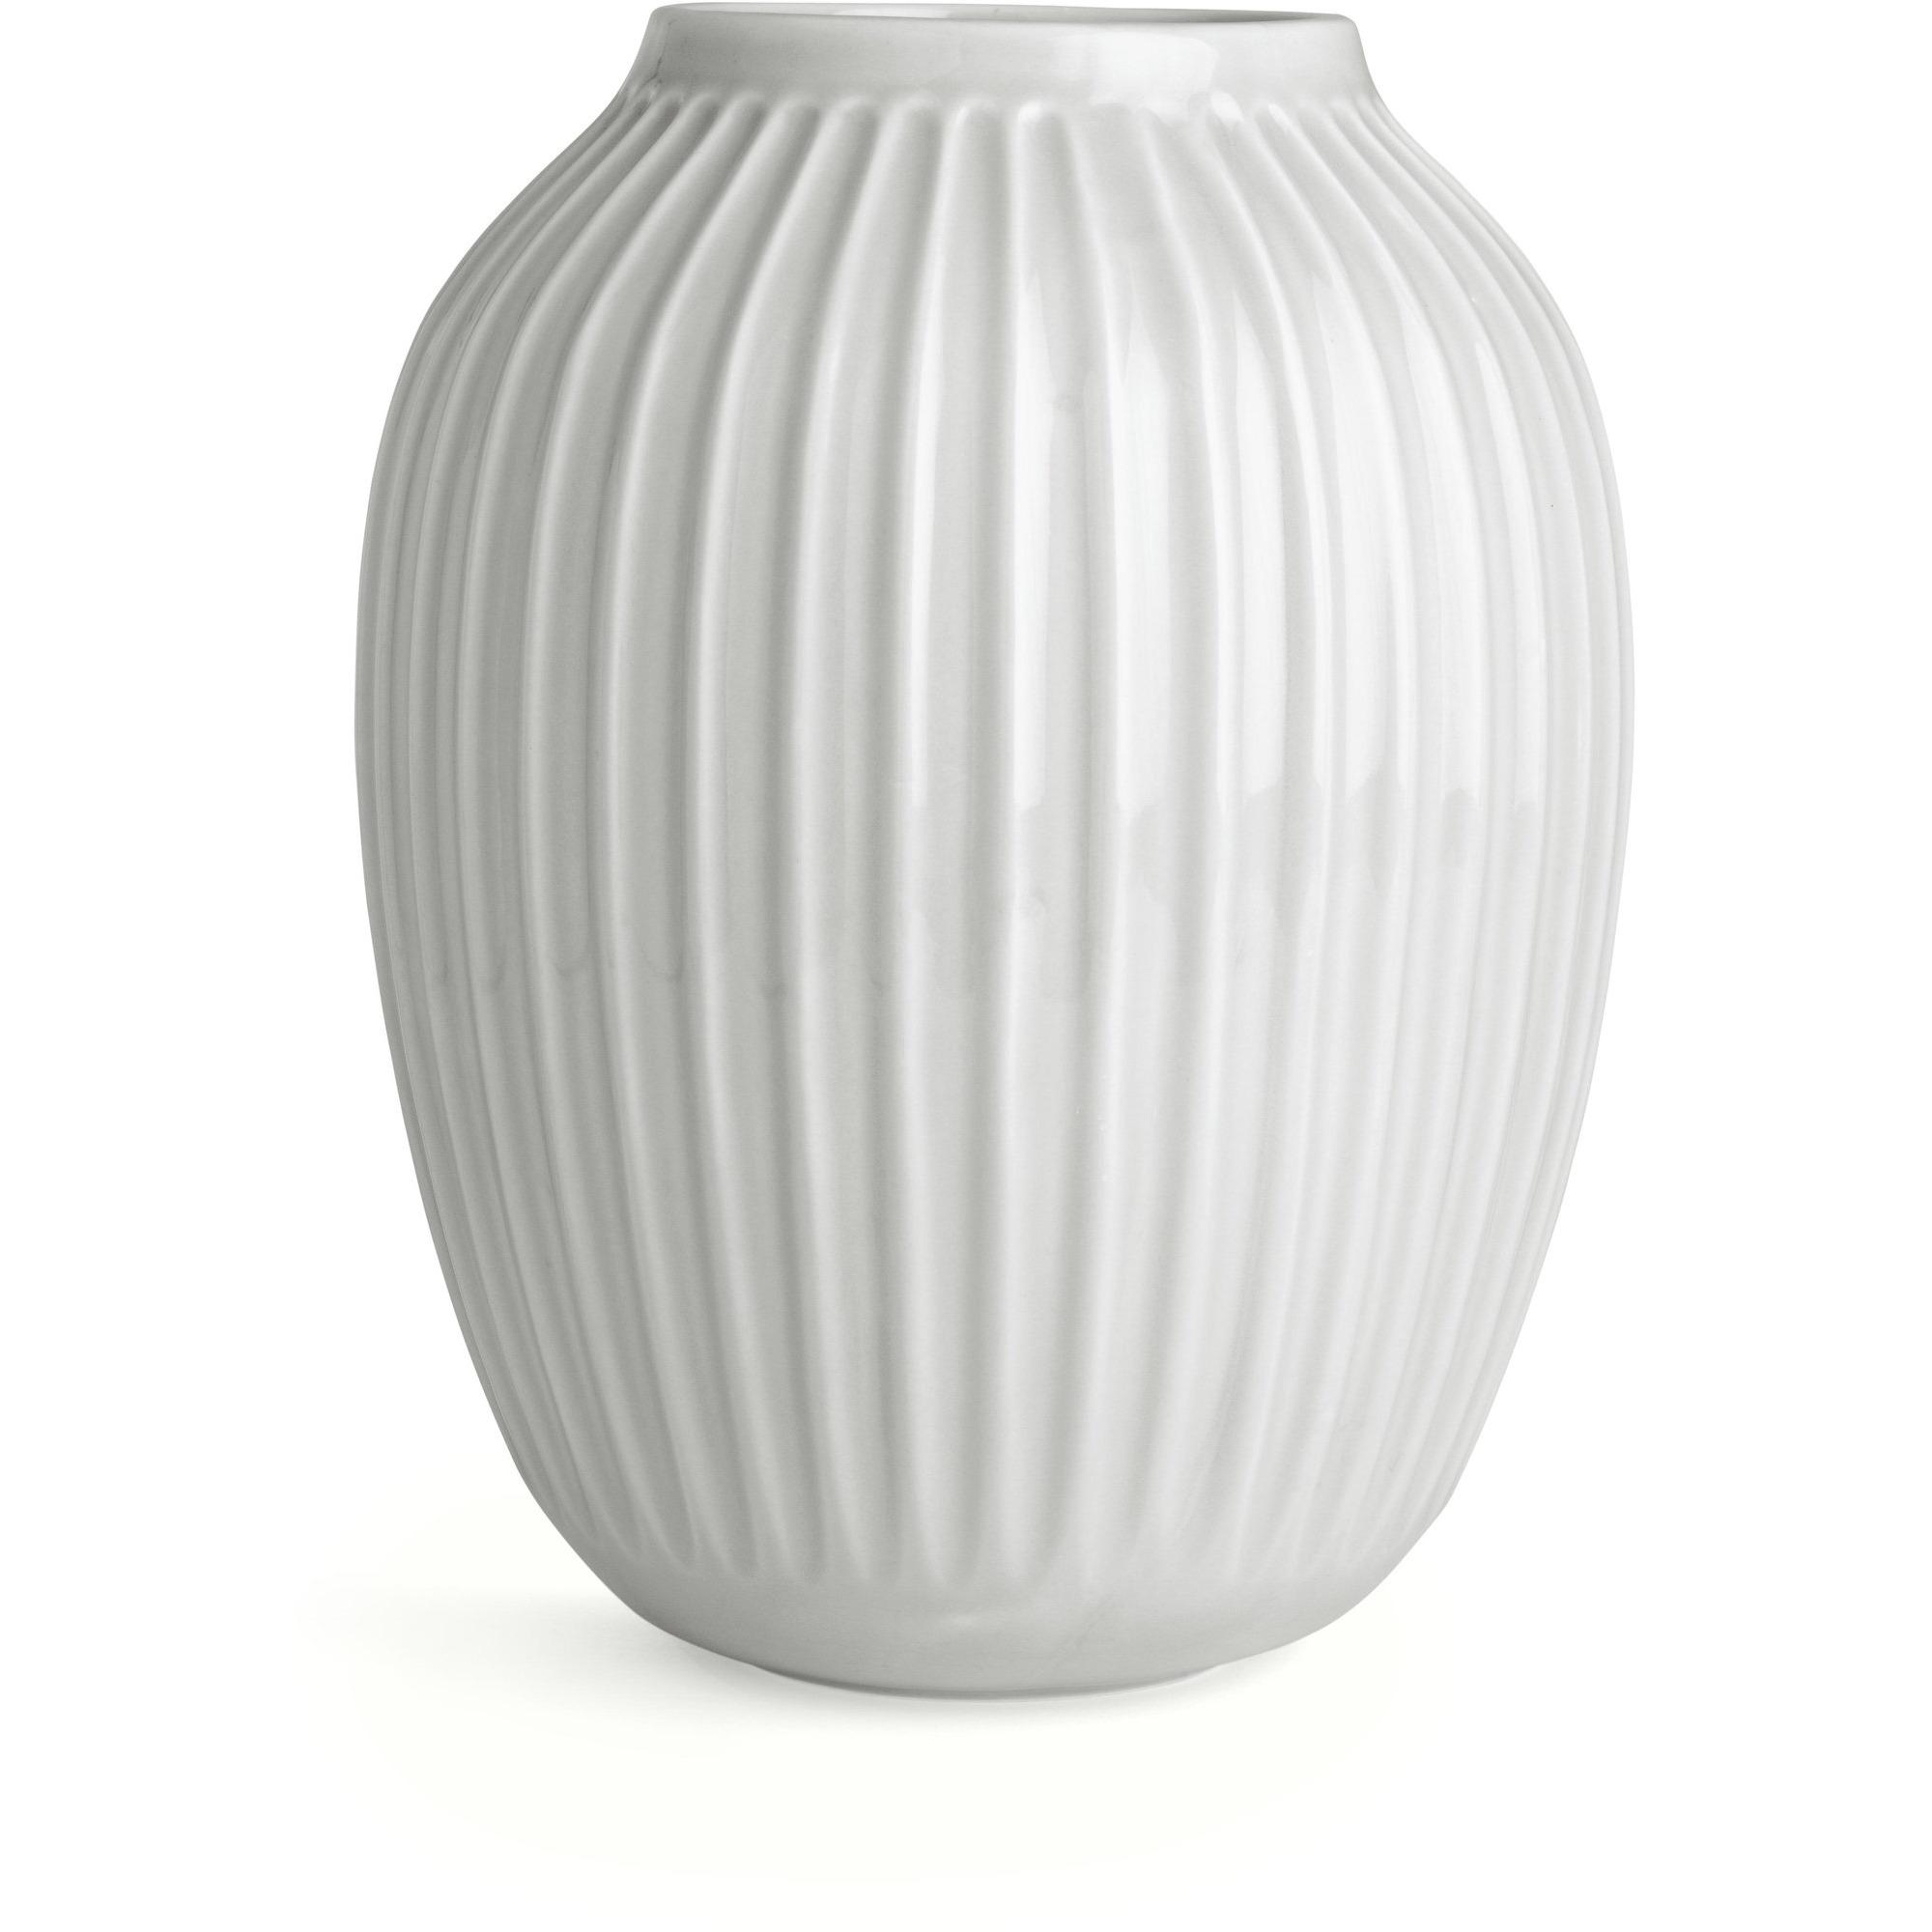 Nye Hammershøi vase 25 cm. fra Kähler » Elegant og karakteristisk vase MV-72